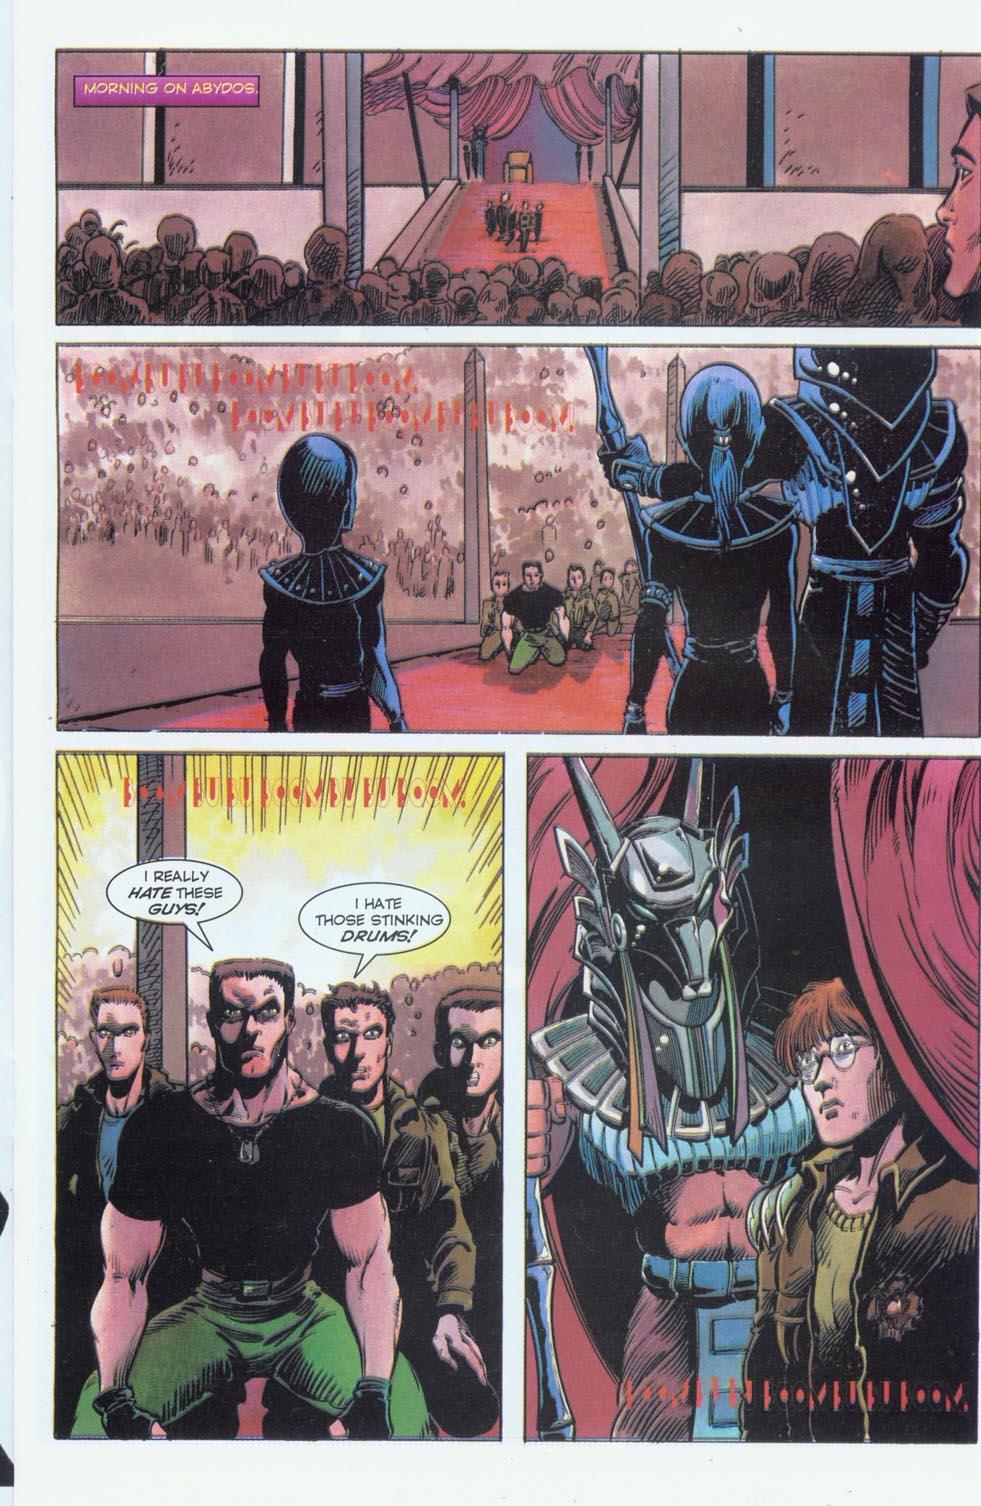 Read online Stargate comic -  Issue #3 - 15